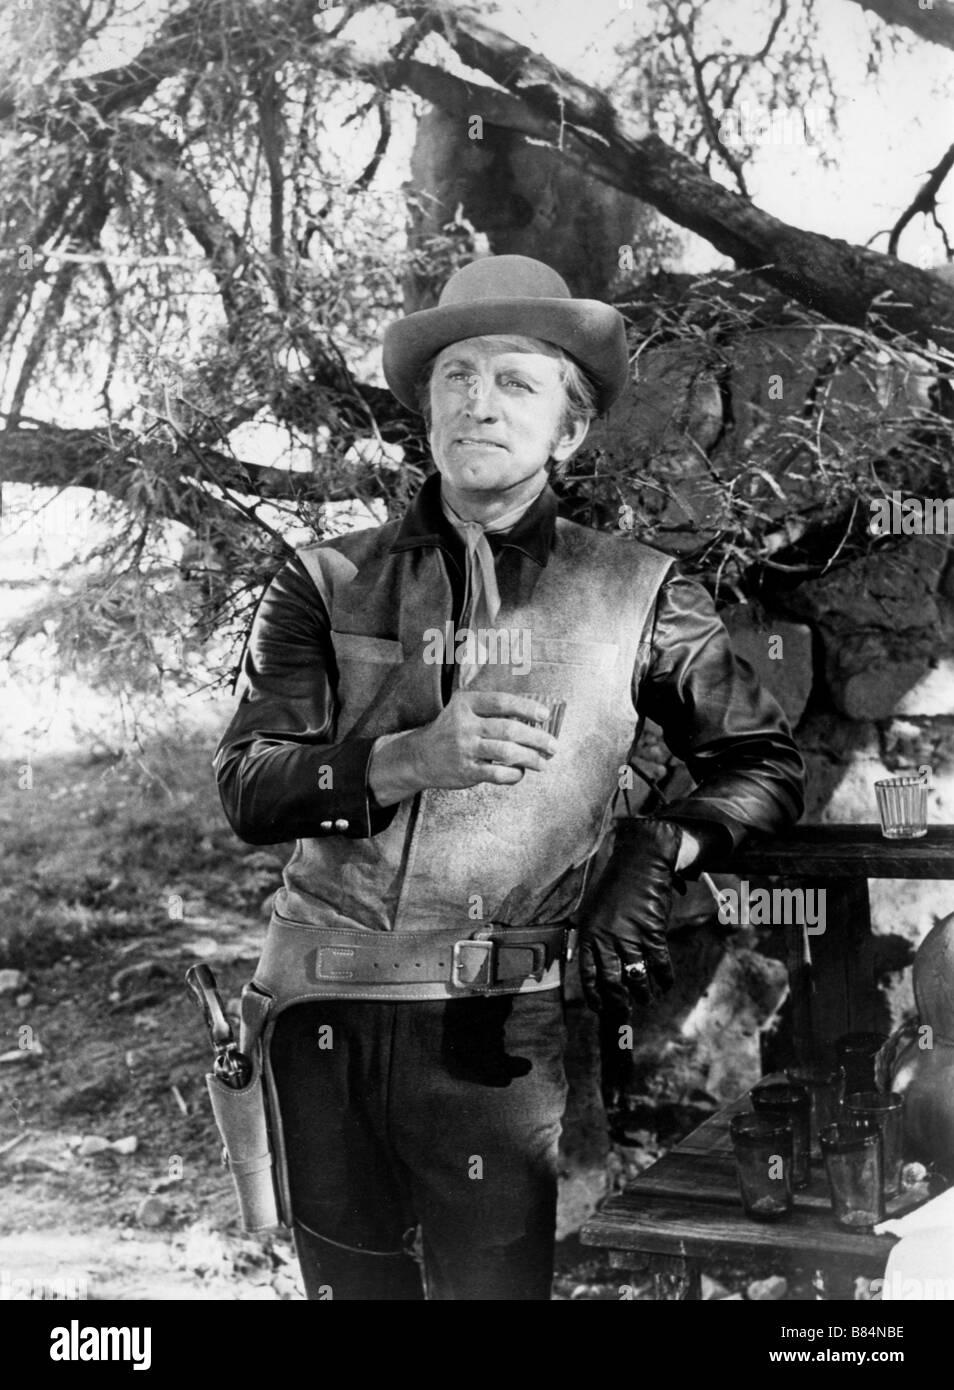 The War Wagon (1967) USA Kirk Douglas  Director: Burt Kennedy - Stock Image